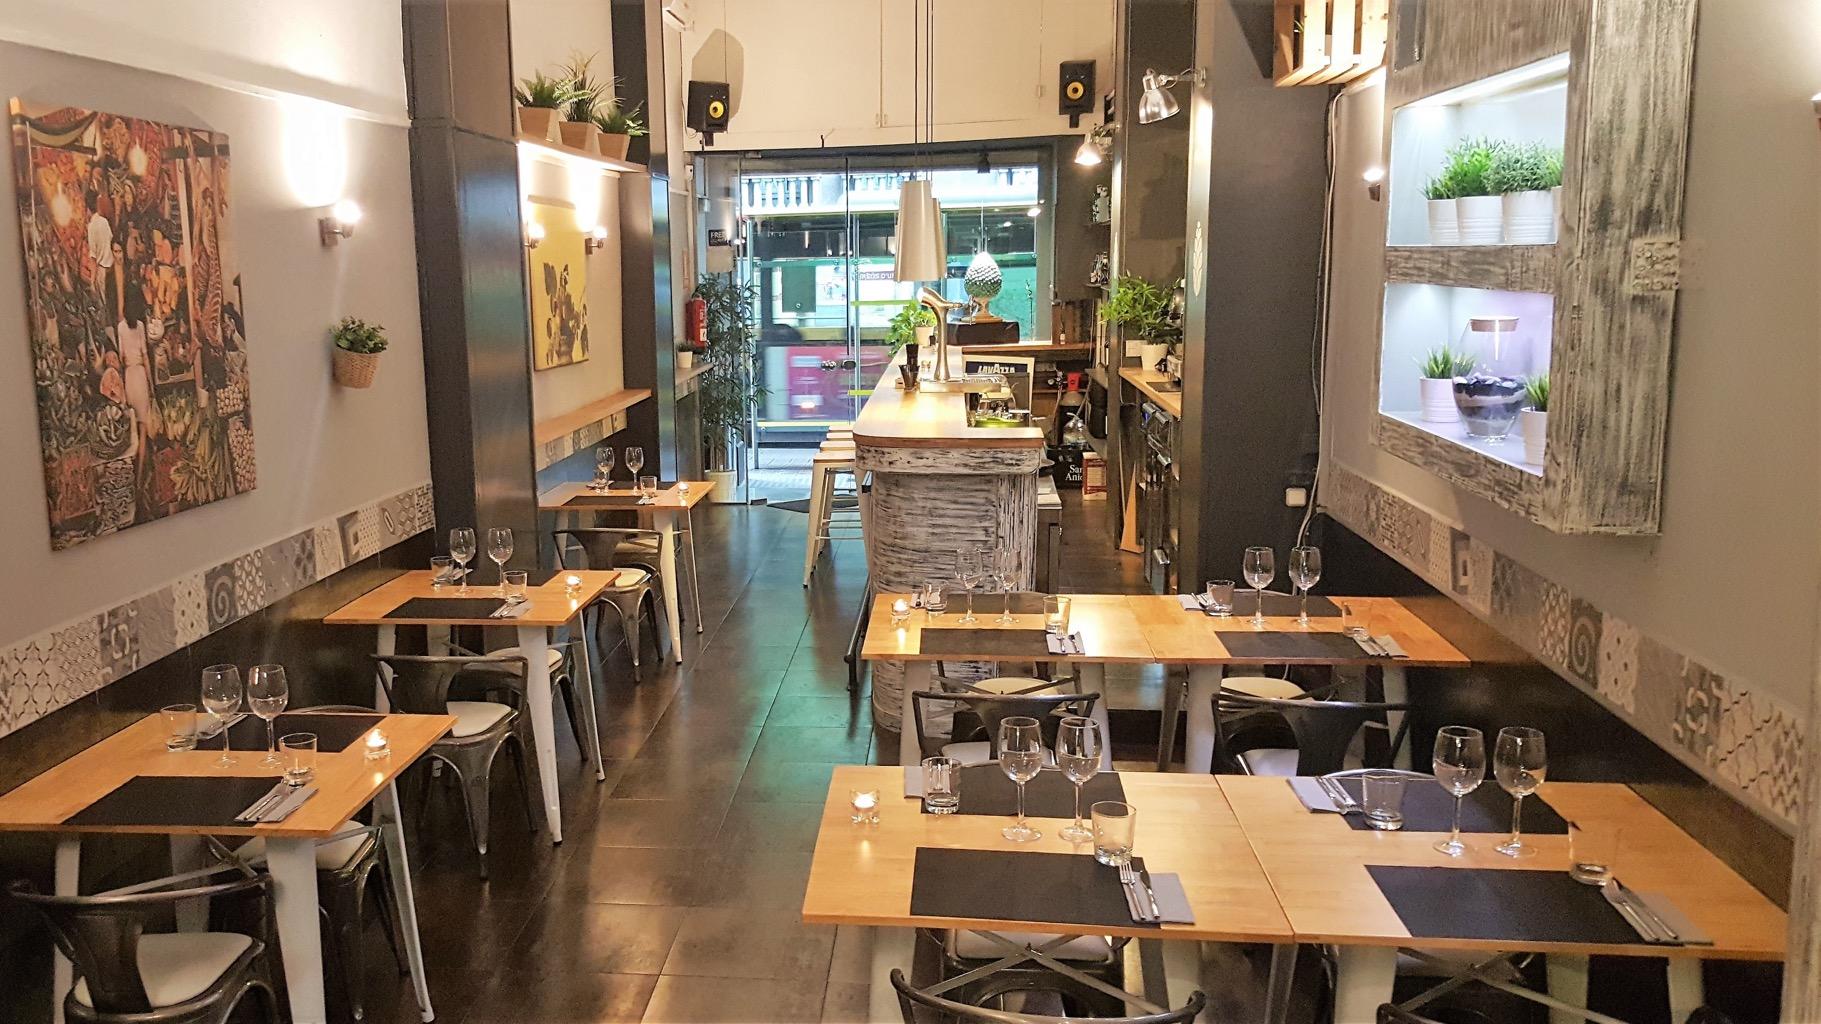 Restaurante-Galú-comedor-rockinchiclifestyle